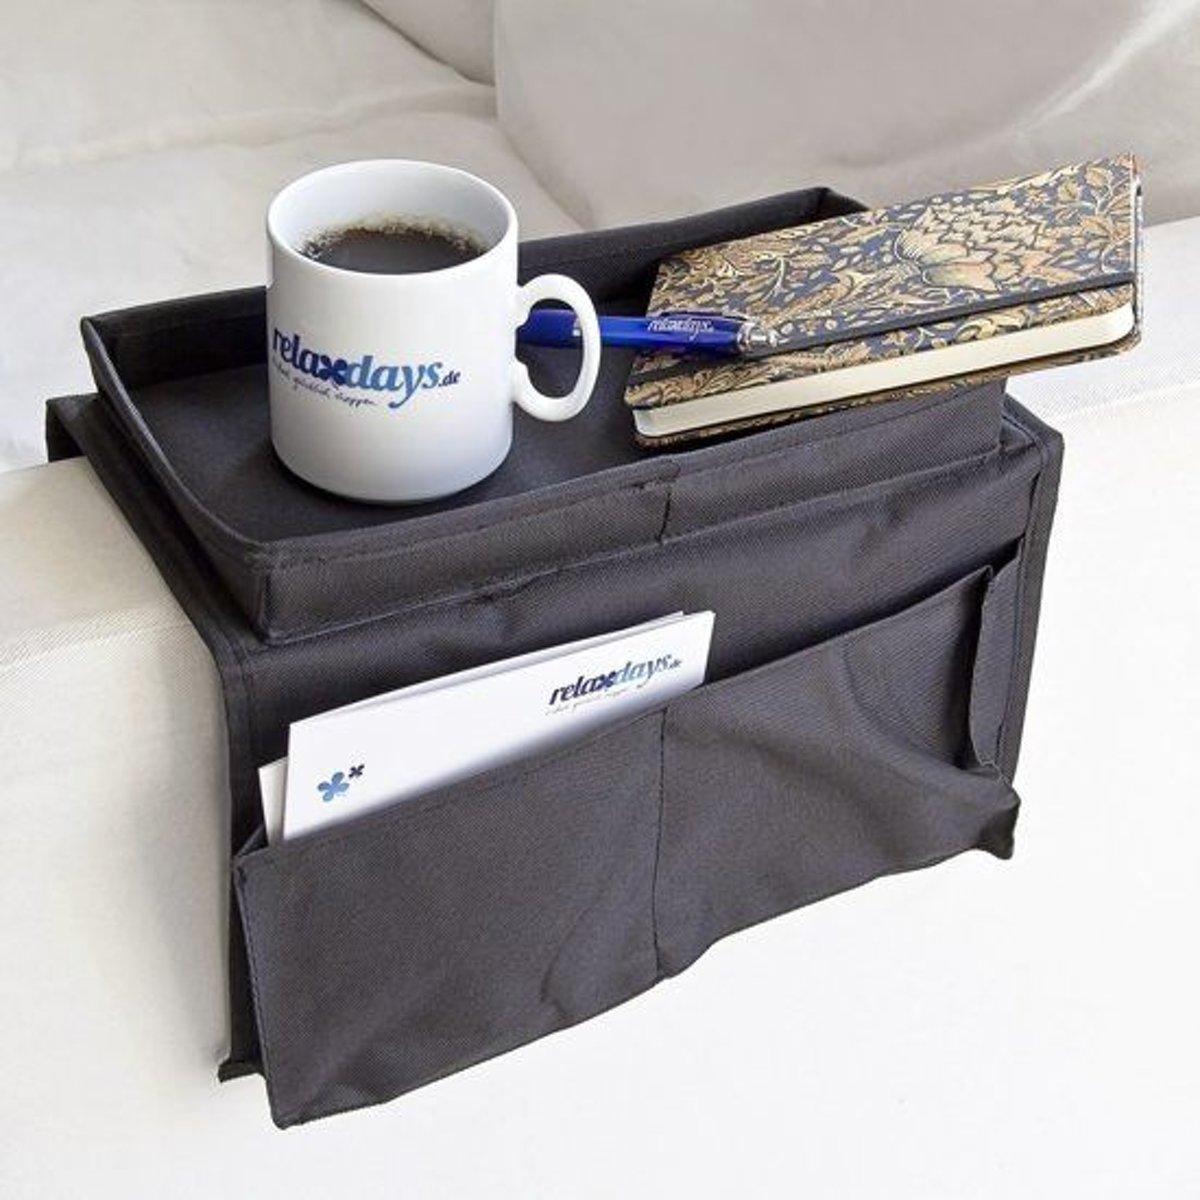 relaxdays armleuning organizer, armleuning dienblad met opberger, sofa 6 zakjes